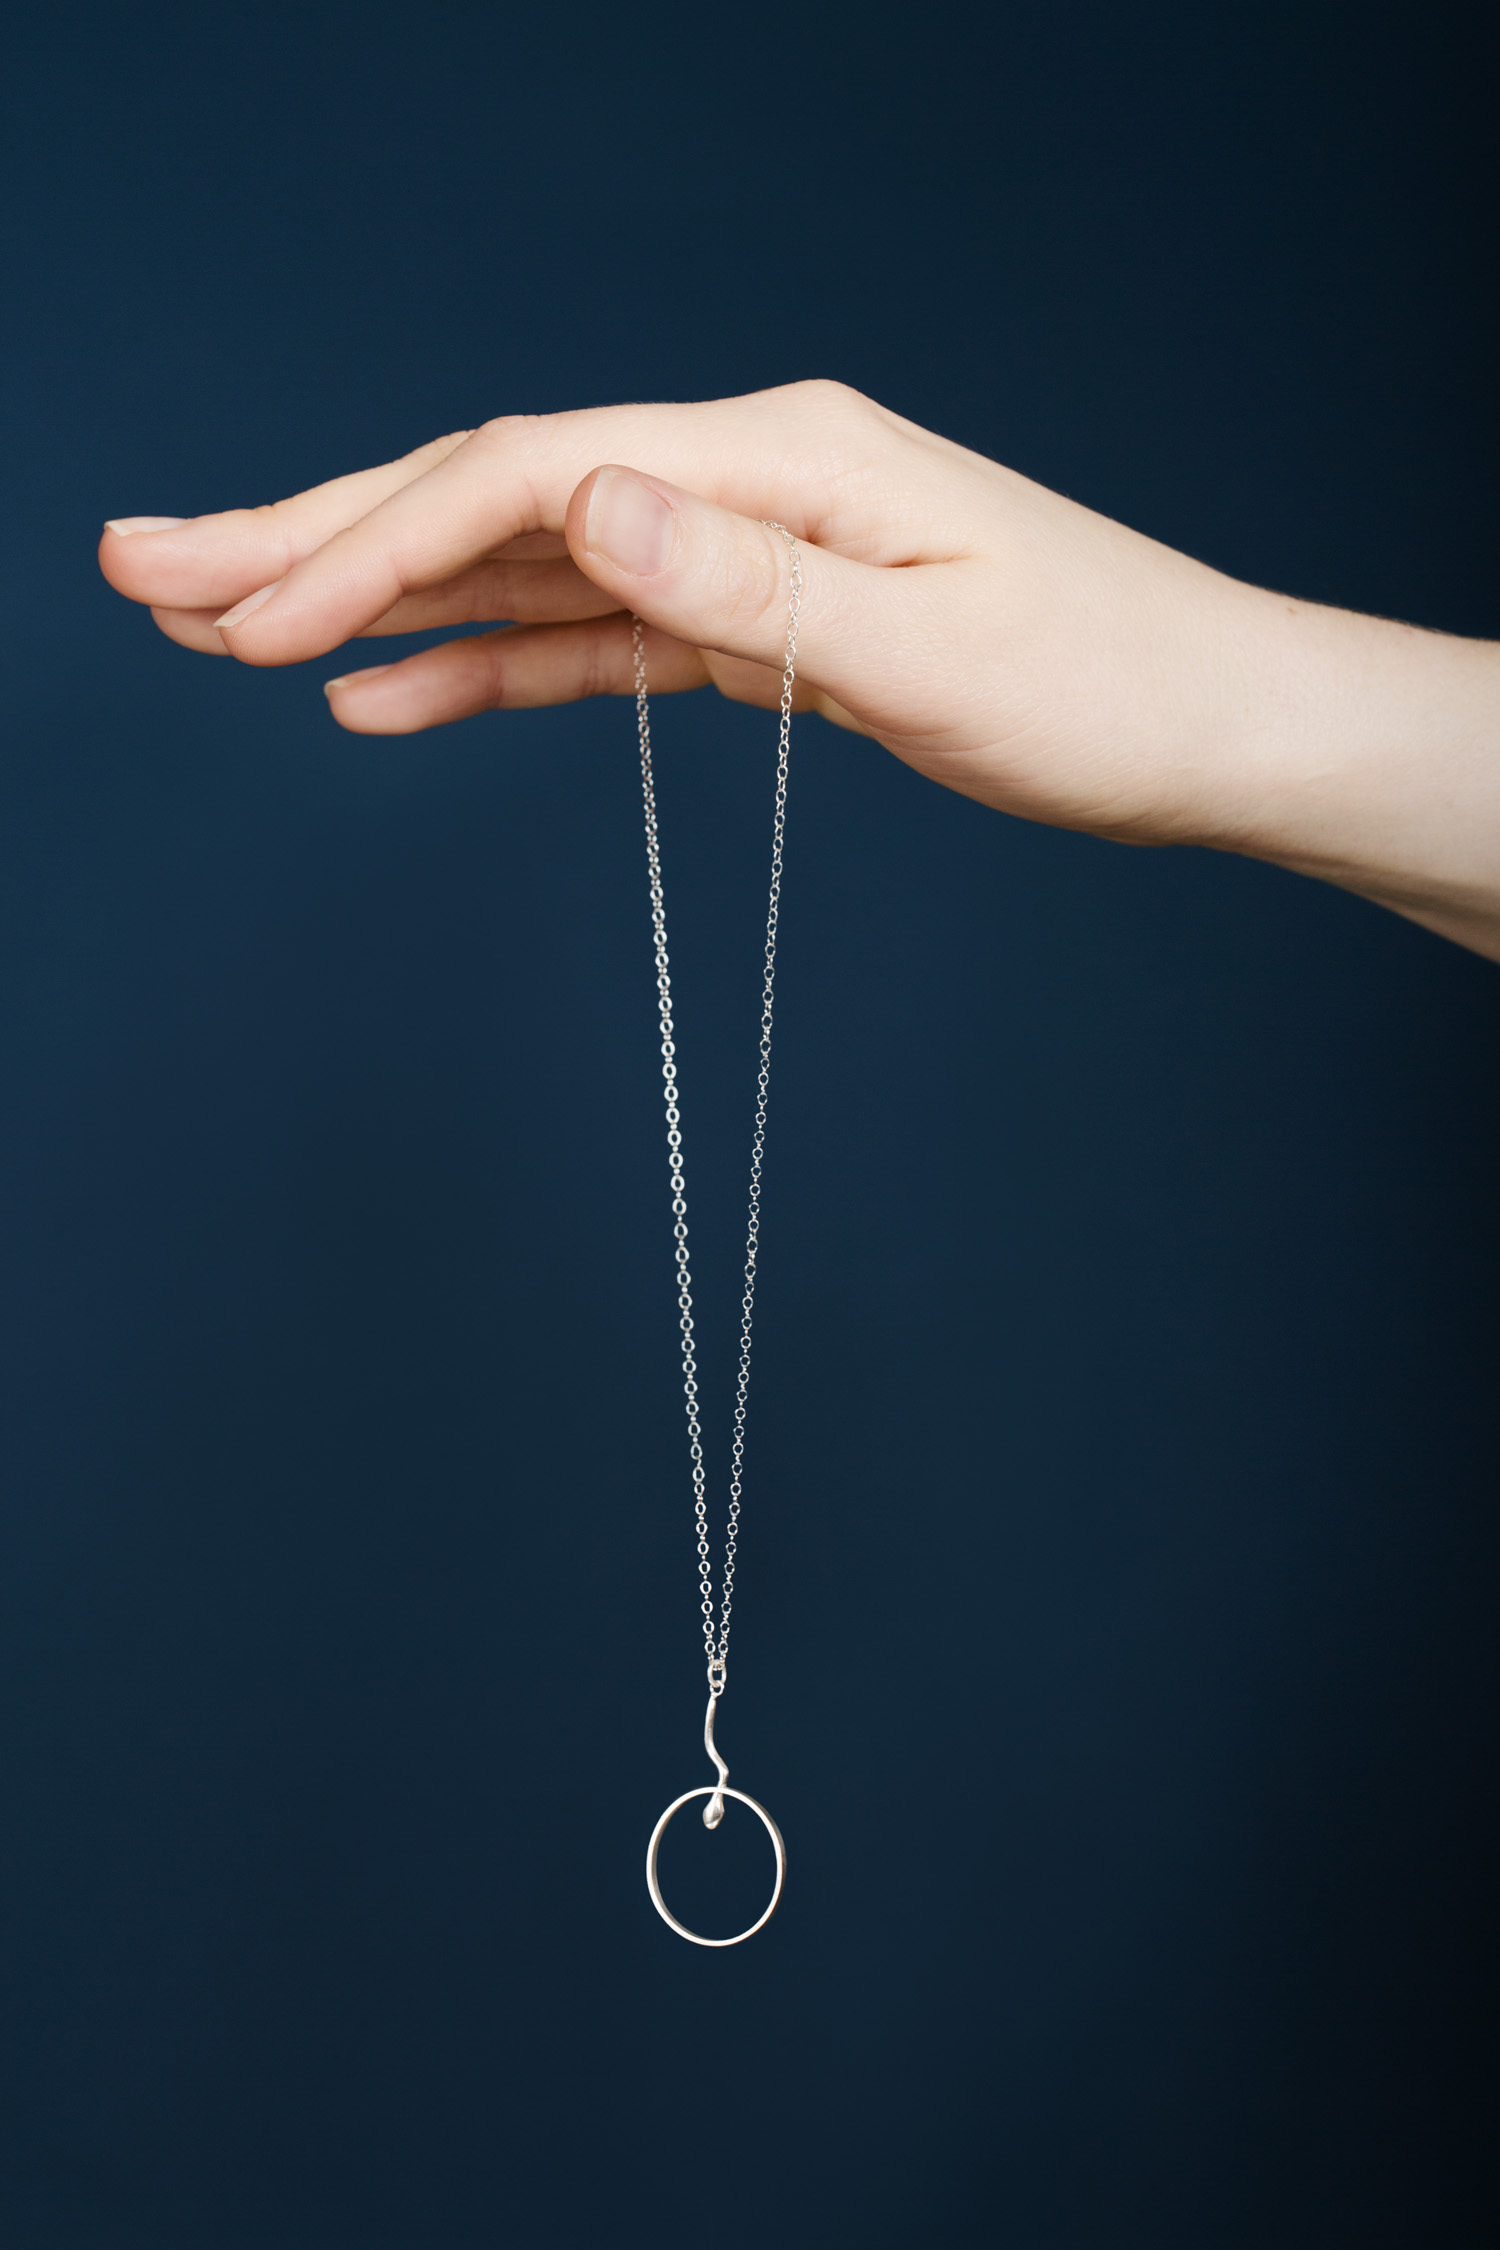 Conception Collection, 'Half way' pendant, silver